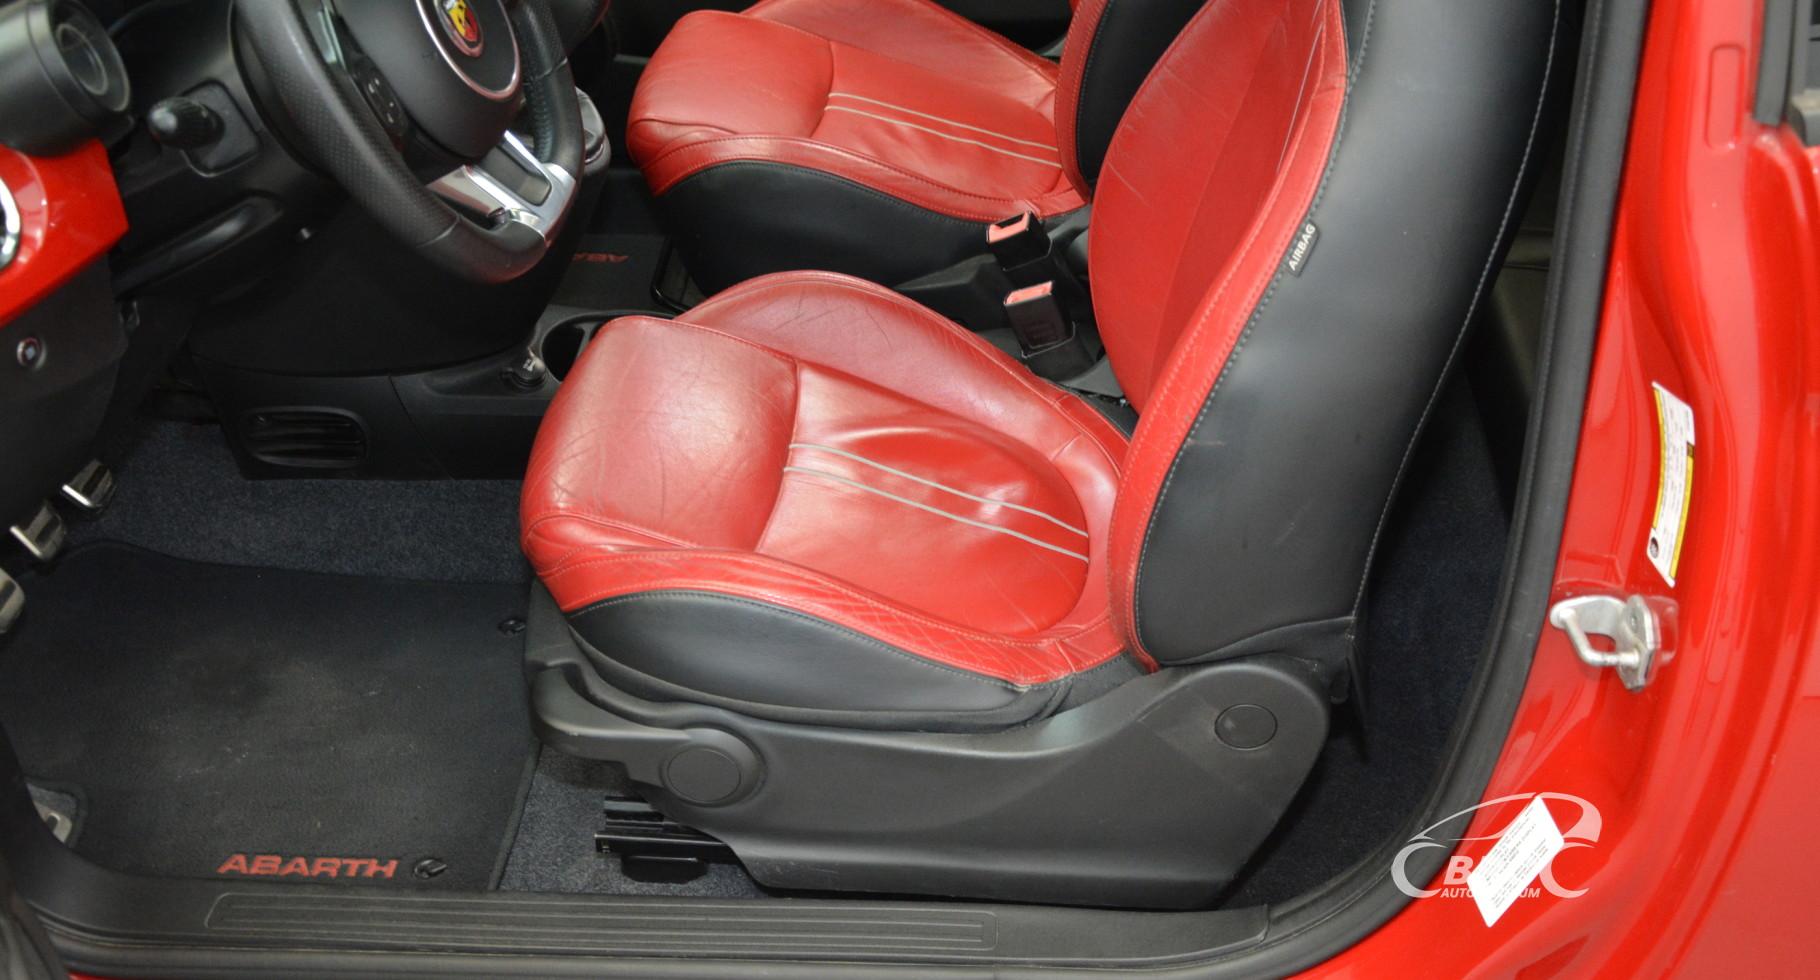 Fiat 500 Abarth 1.4 i